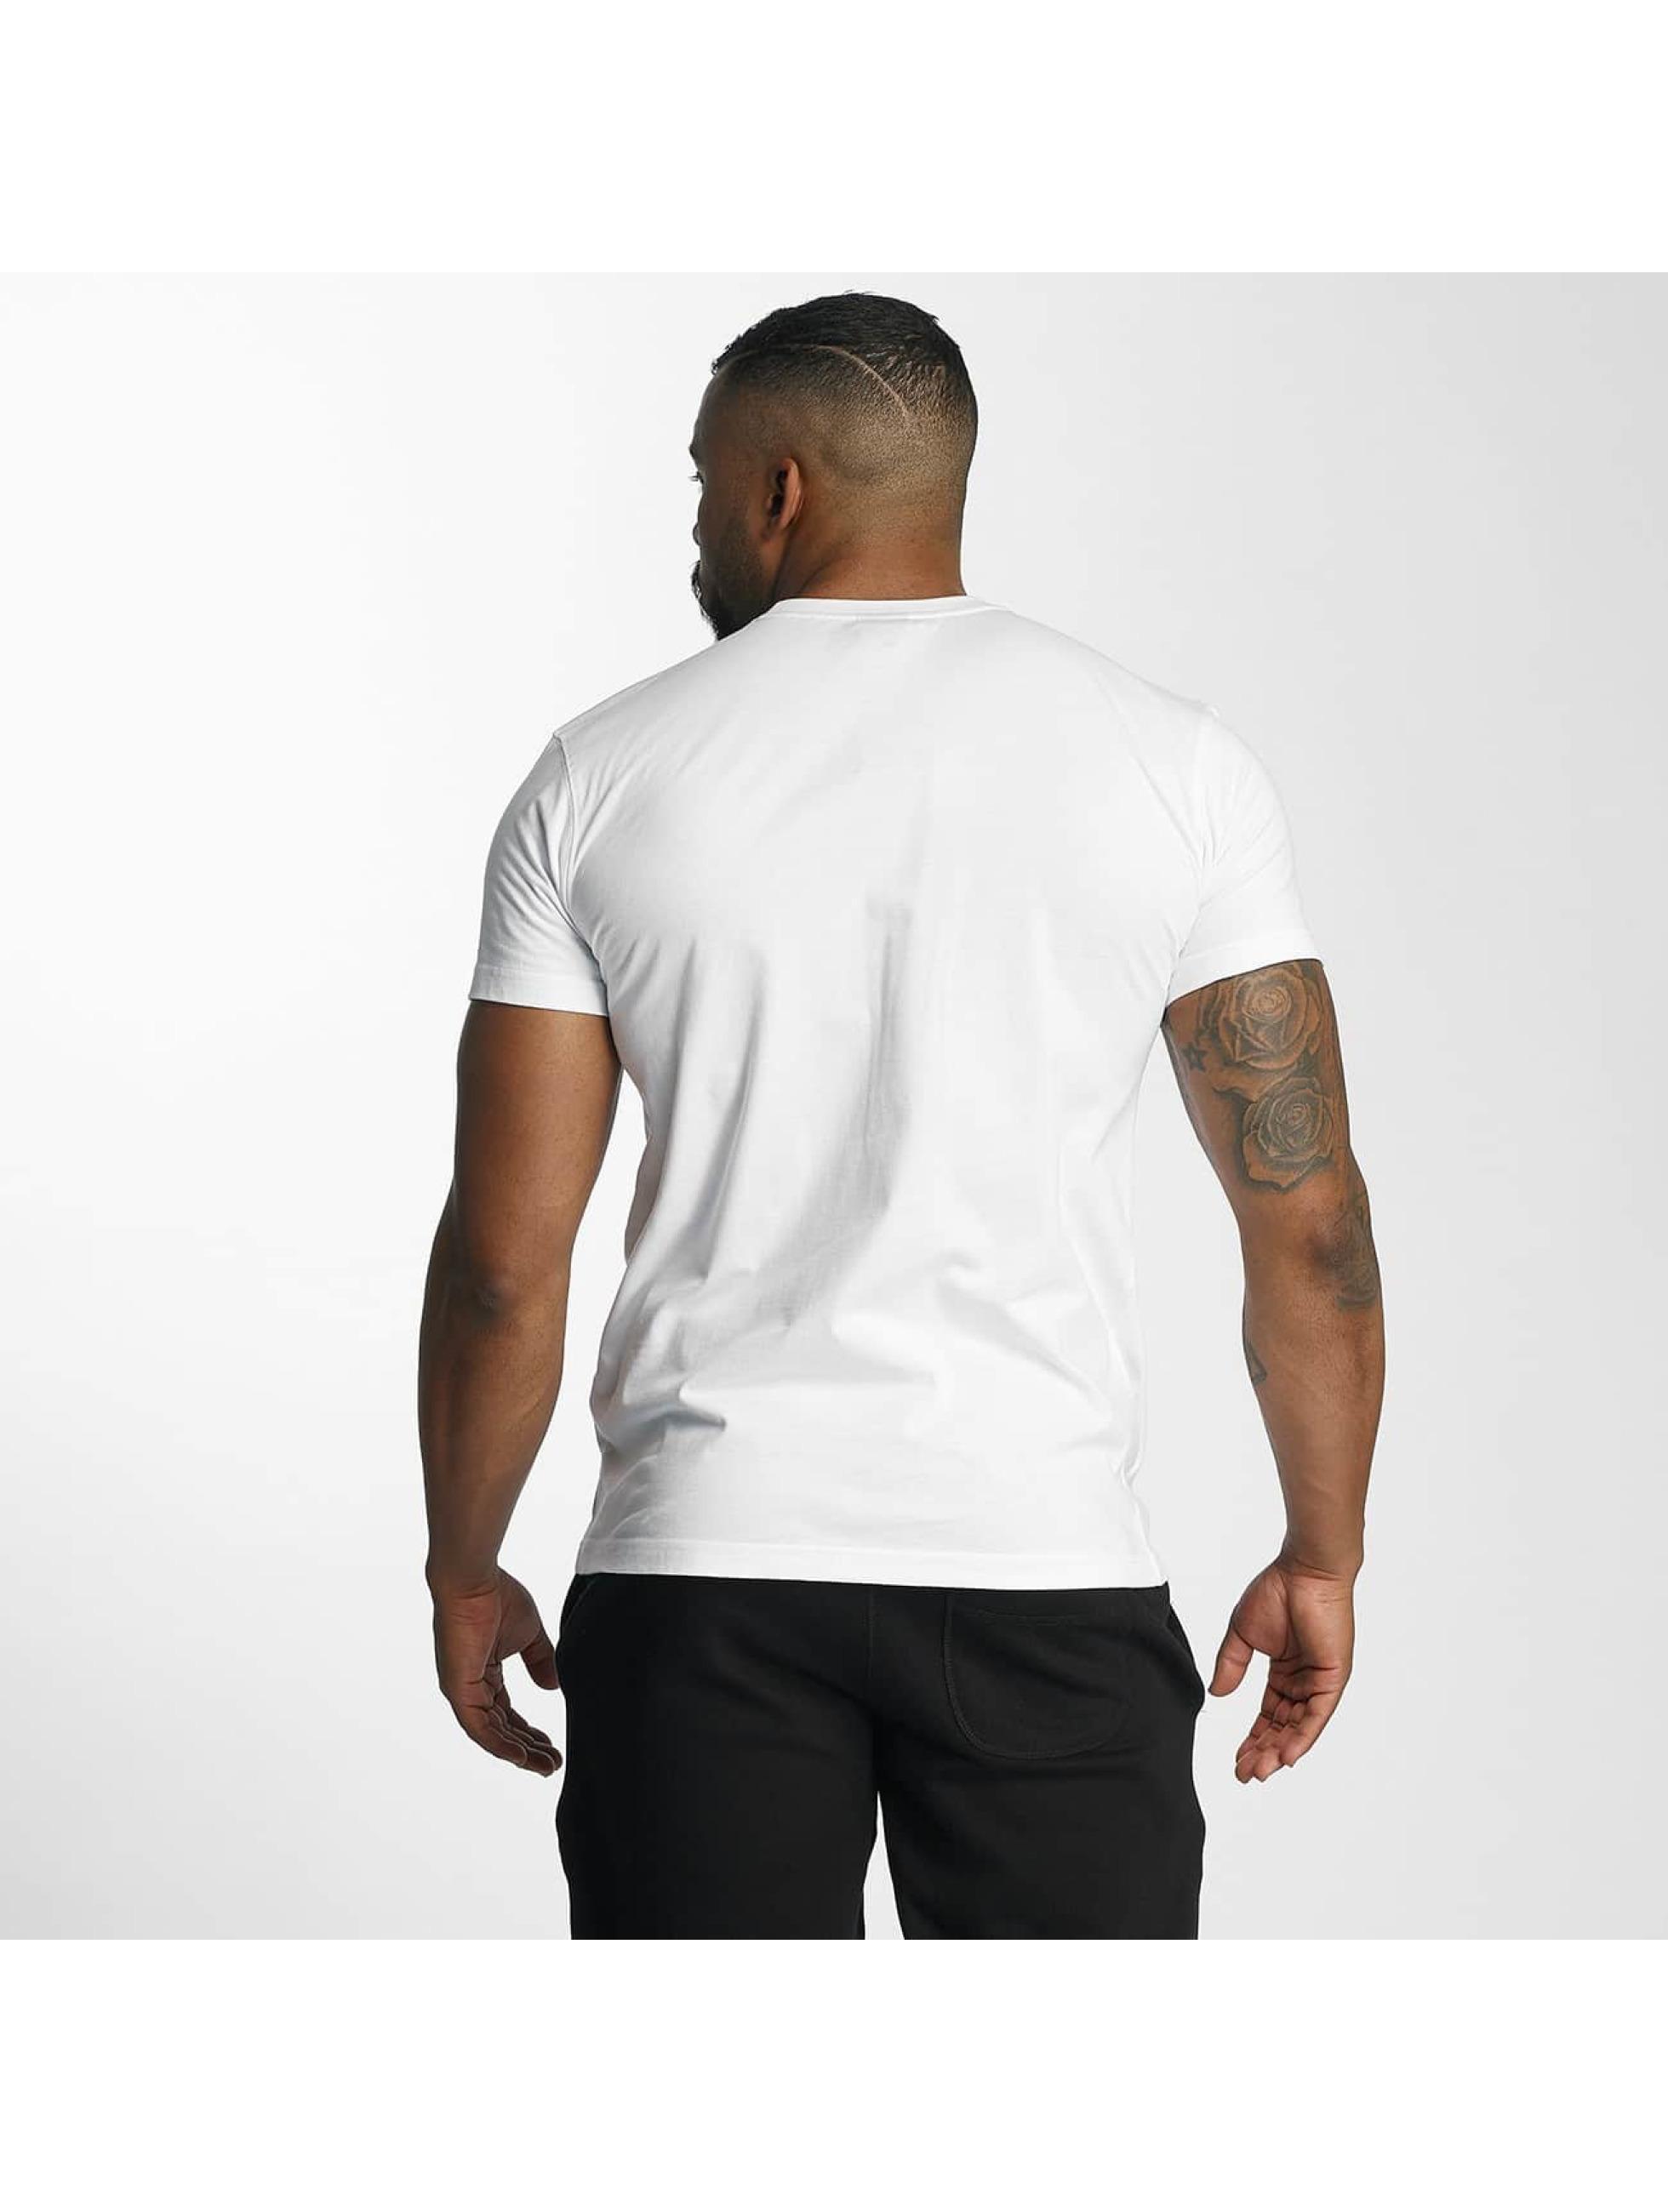 Pusher Apparel T-Shirt White Carrera white